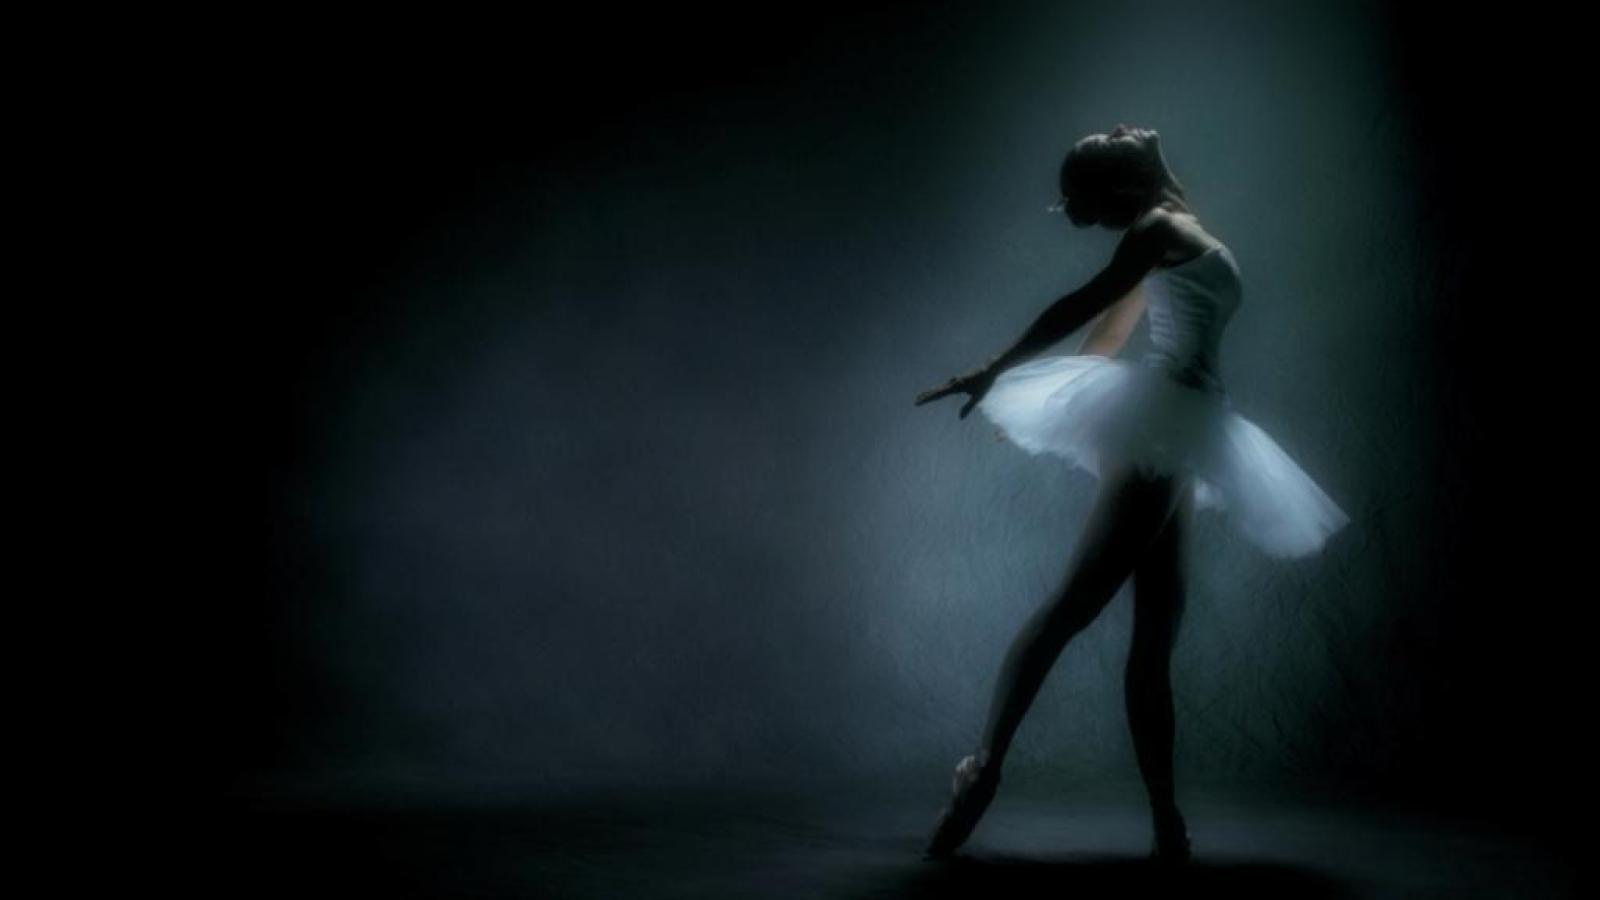 jazz dancer wallpaper - photo #12